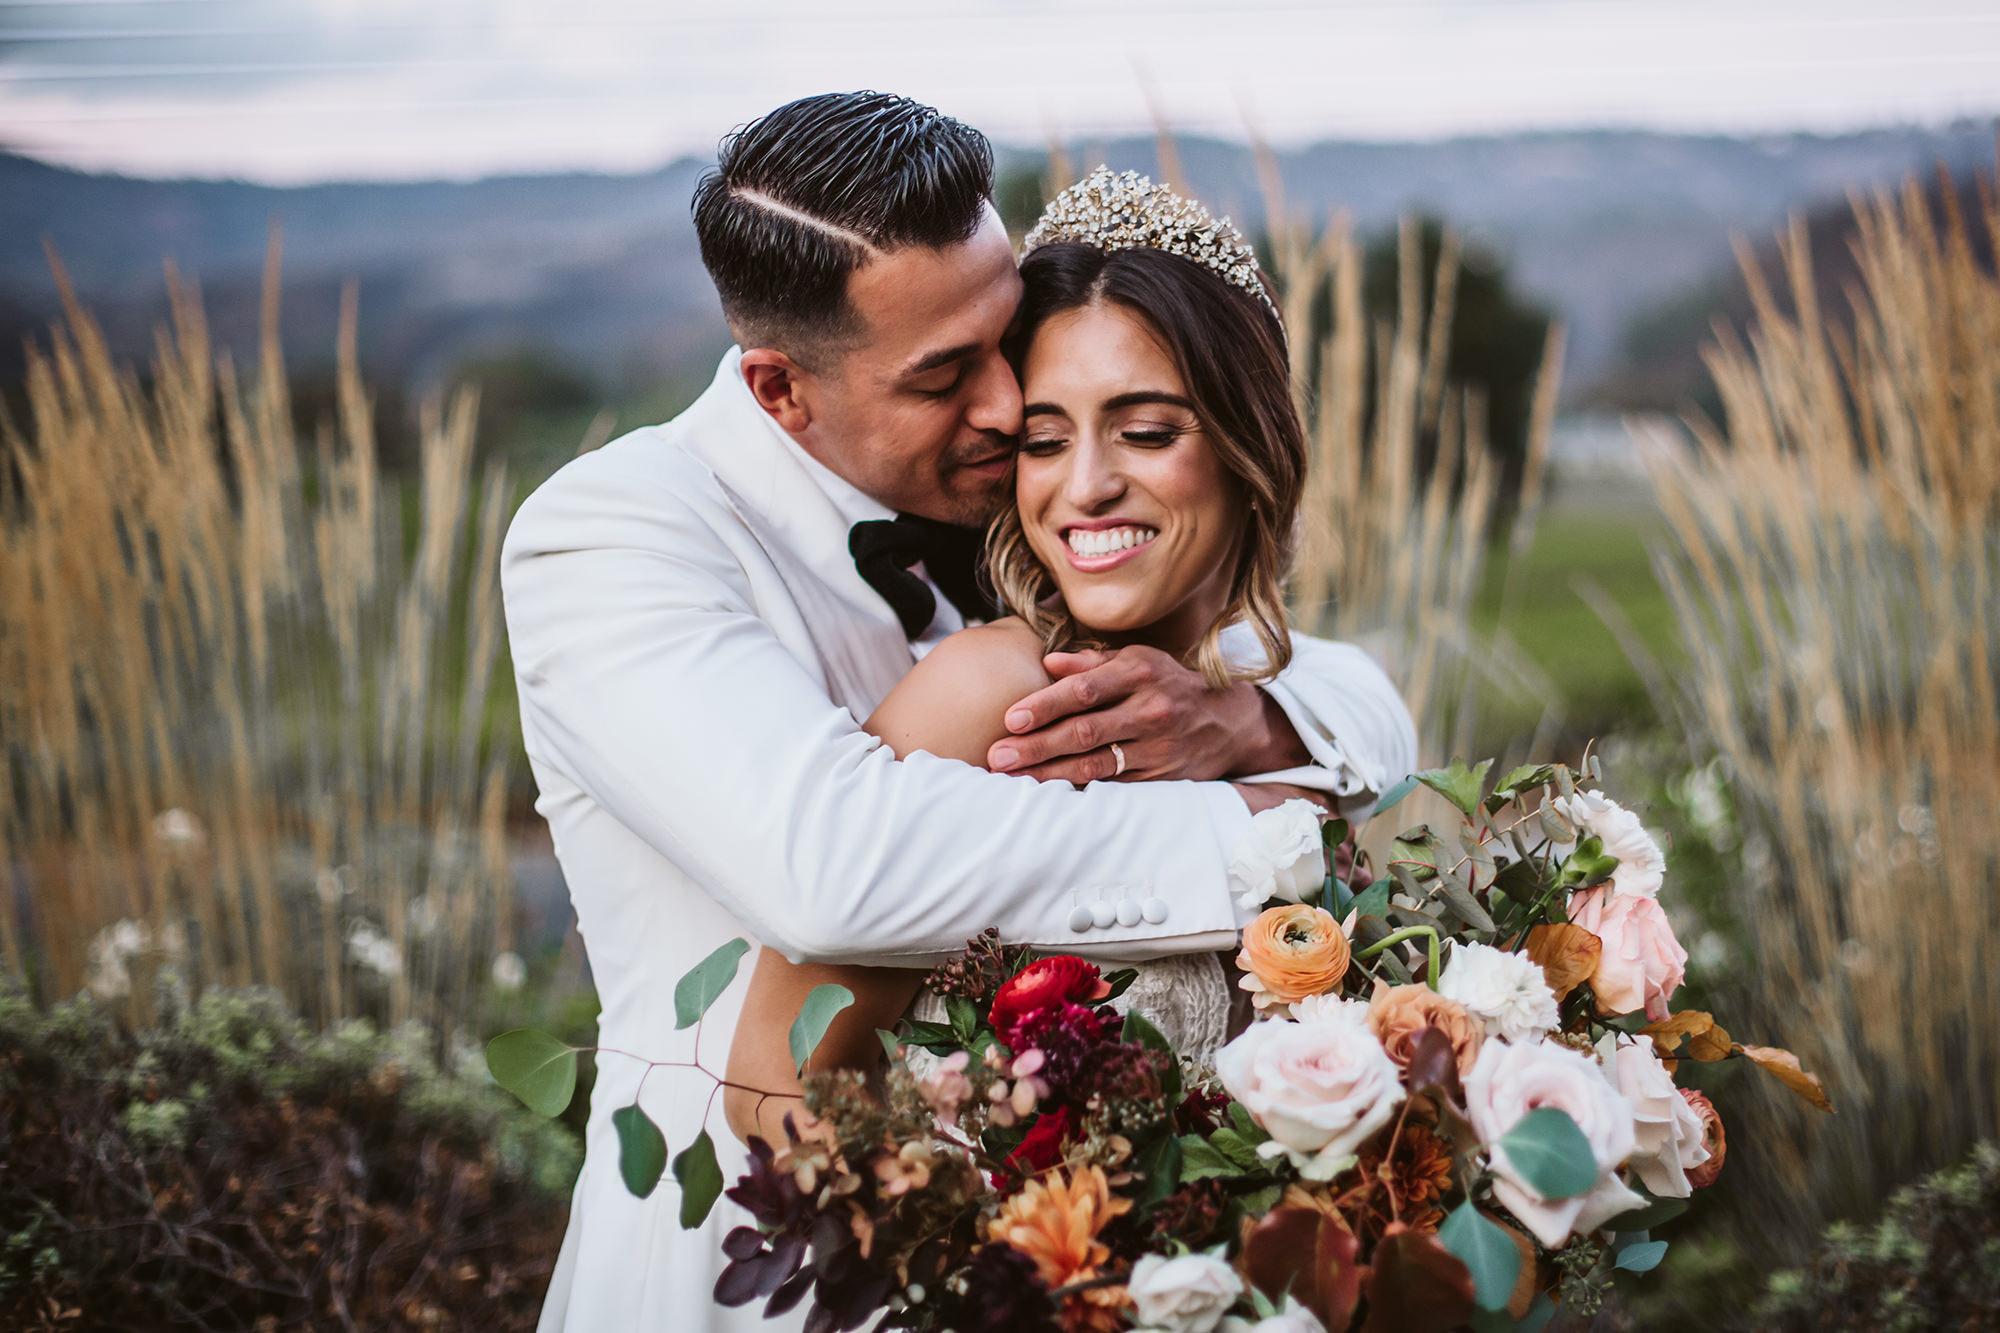 Groom sweetly embraces bride at St Helena wedding.